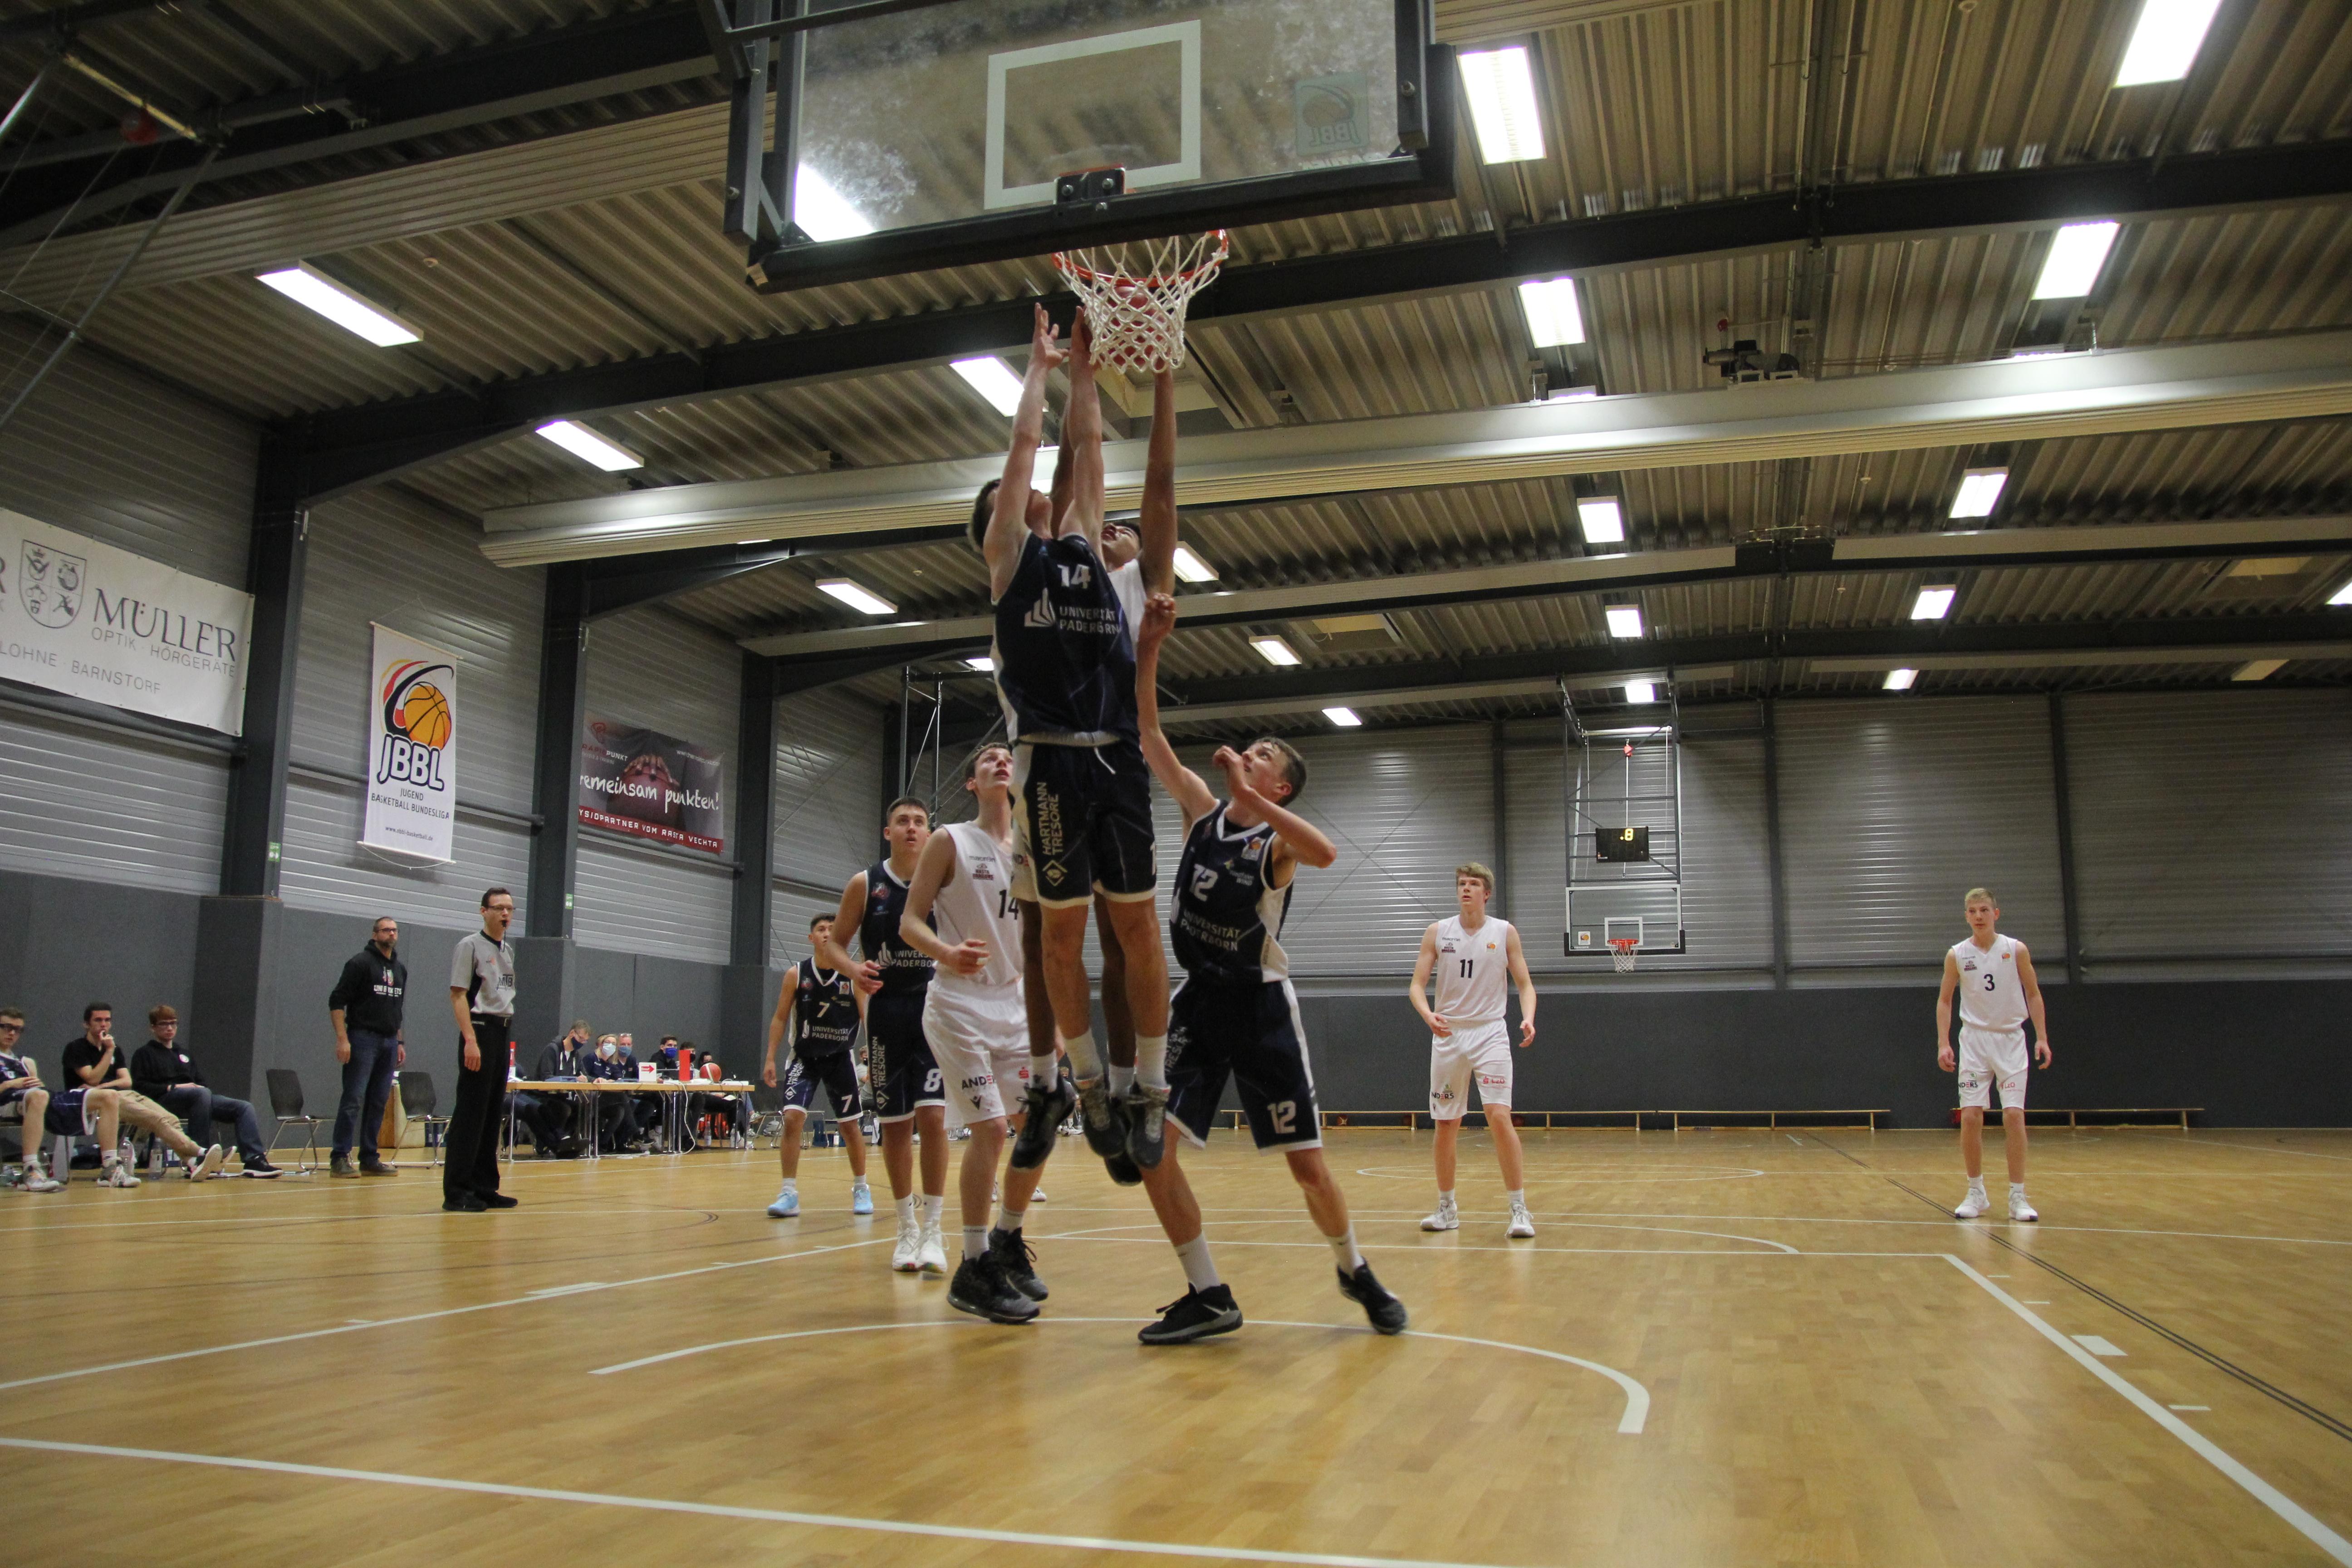 JBBL_20-21_YOUNG-RASTA-DRAGONS_Paderborn_Spieltag2_Martin-Kalu20